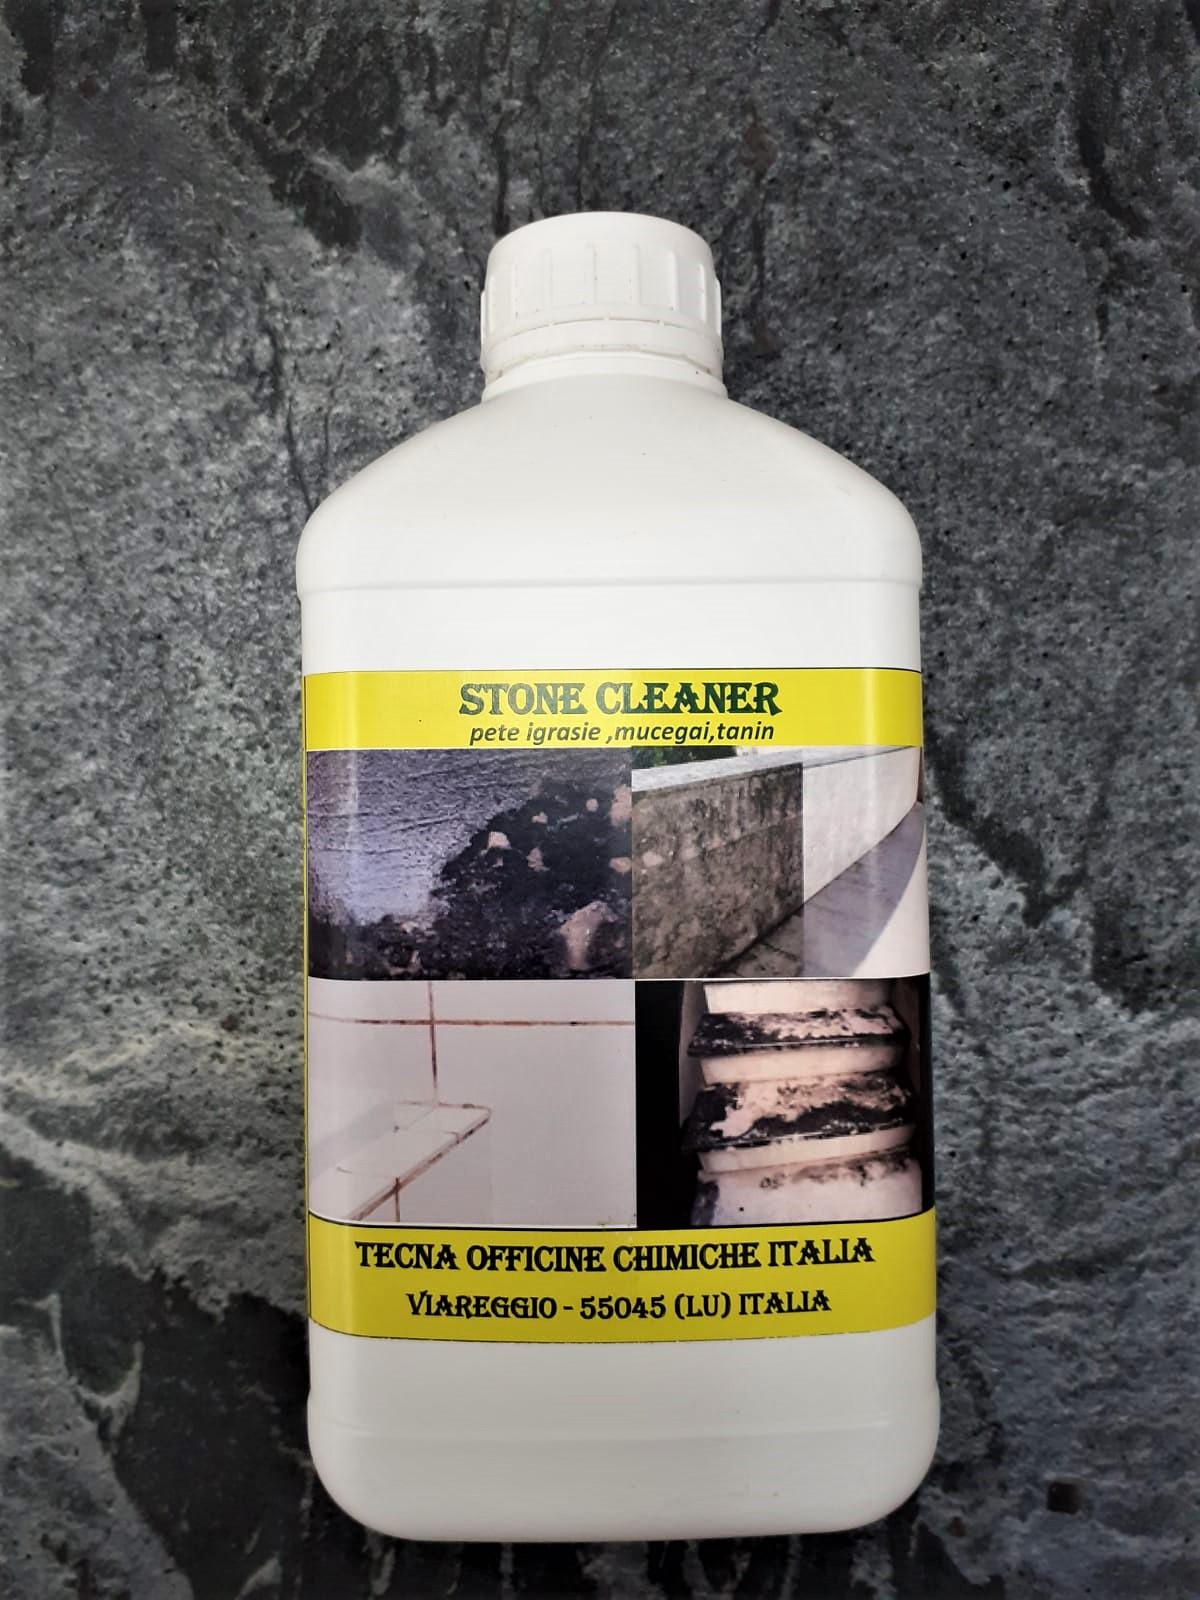 detergent-alcalin-stone-cleaner-1